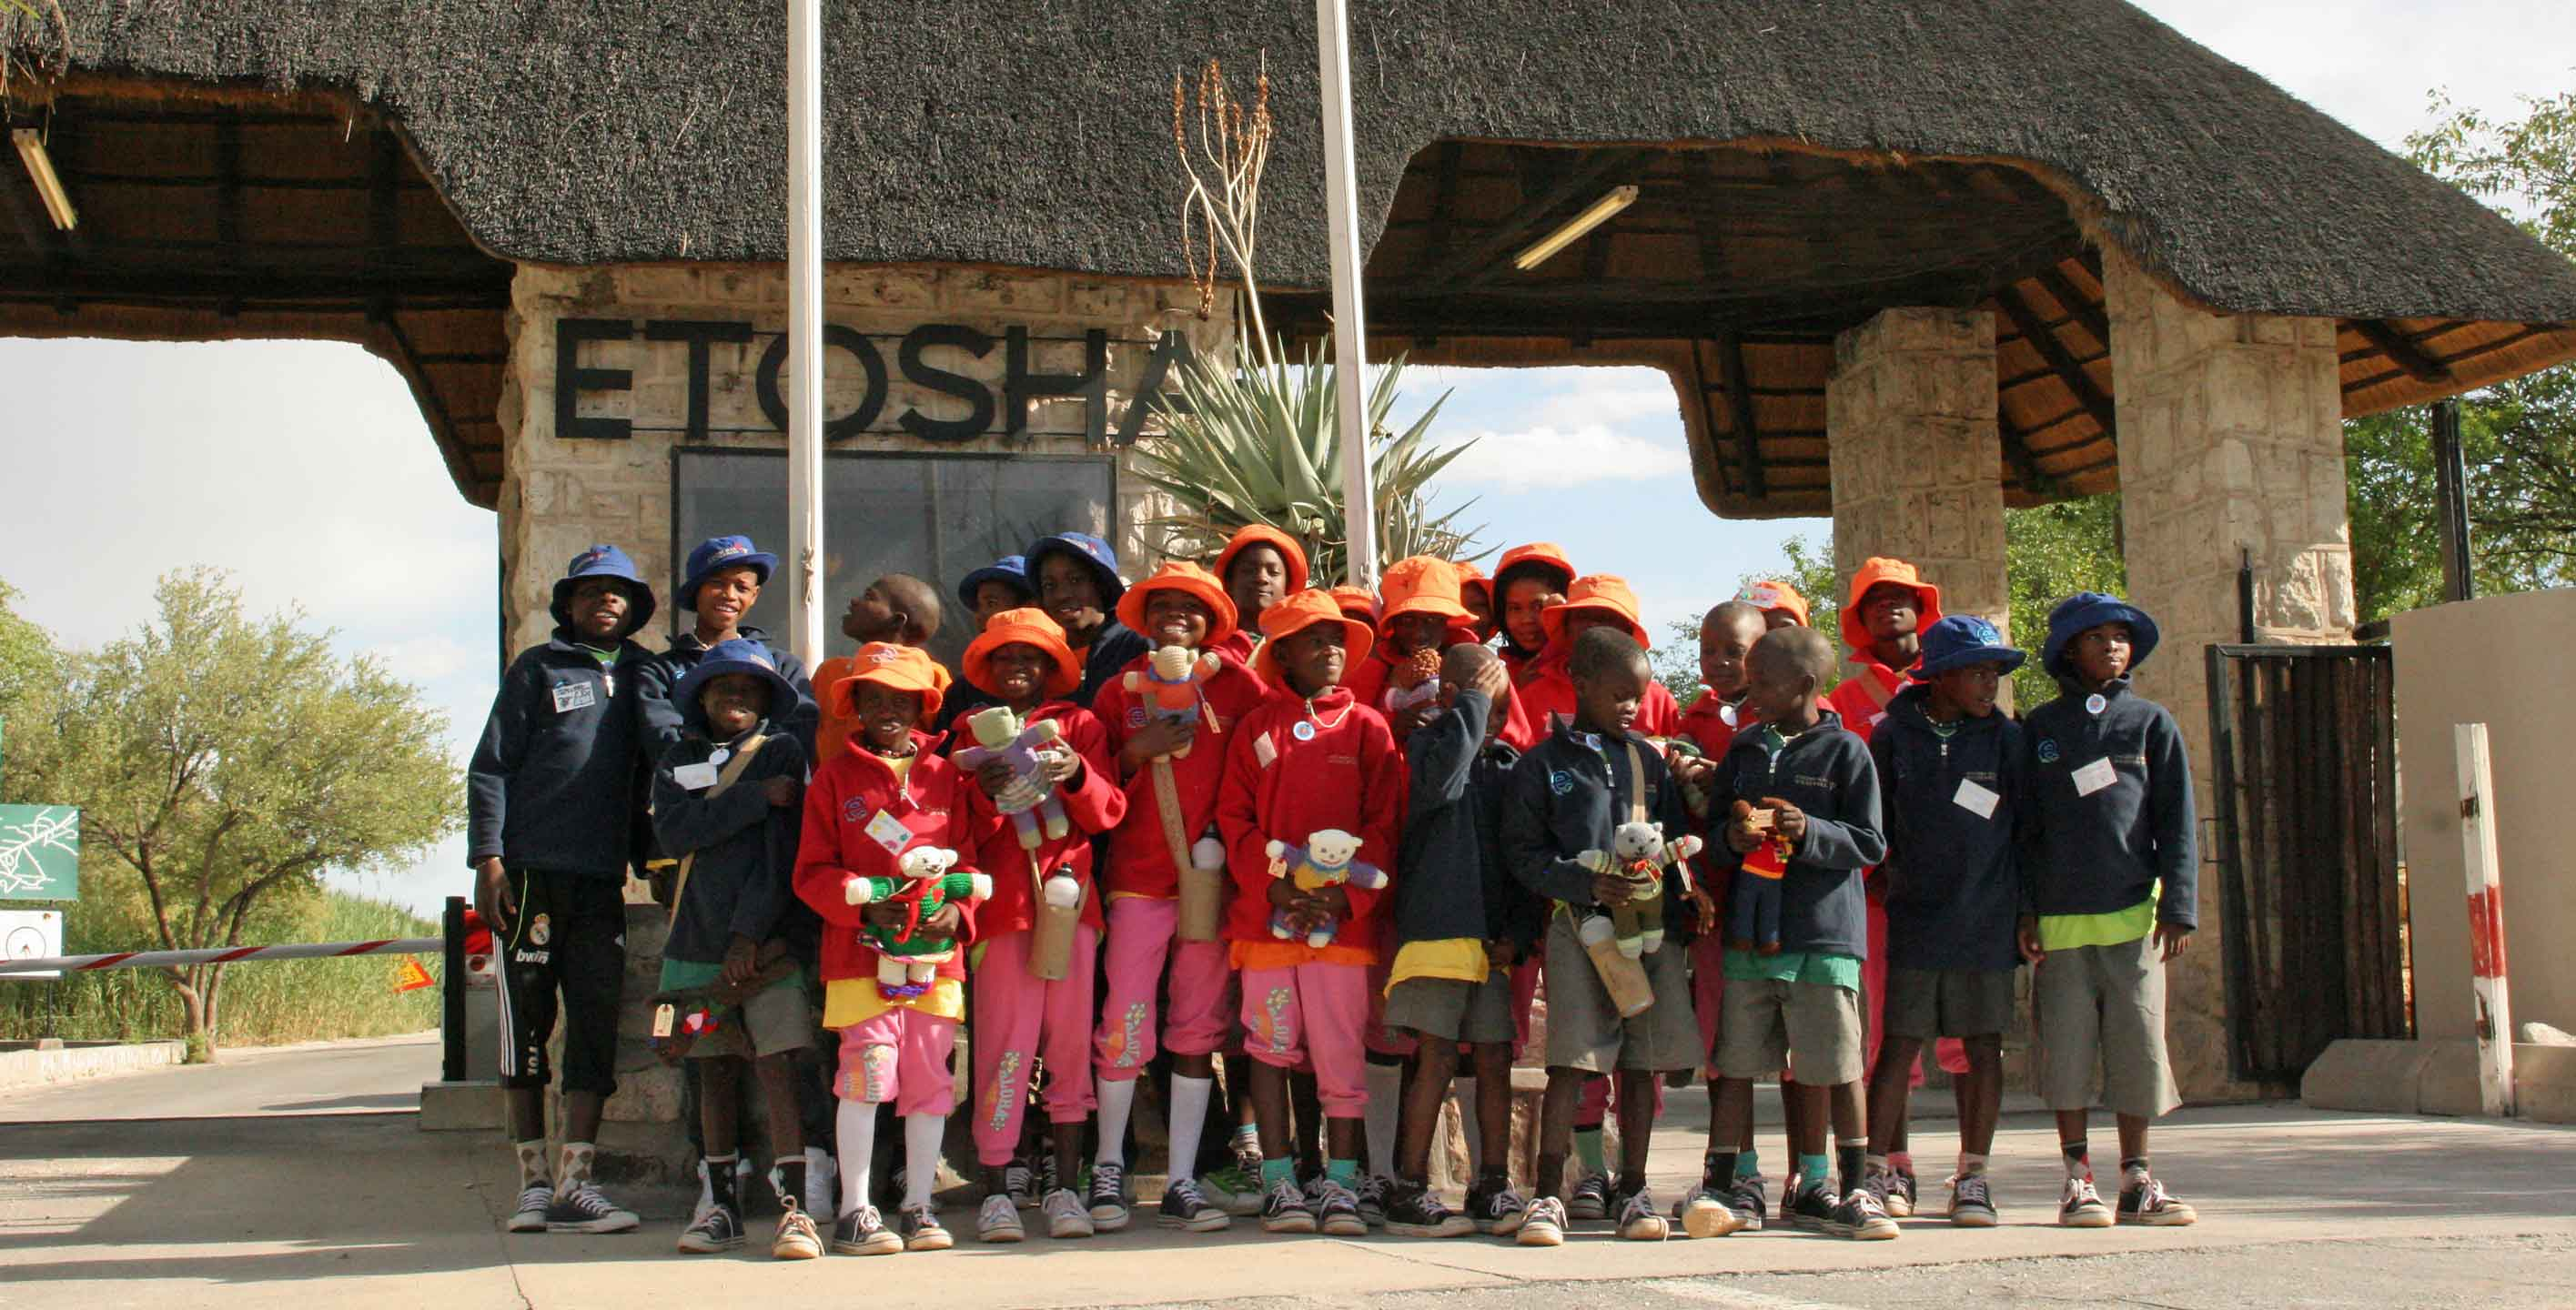 Nachhaltig Reisen in Namibia Etosha Park Kinder